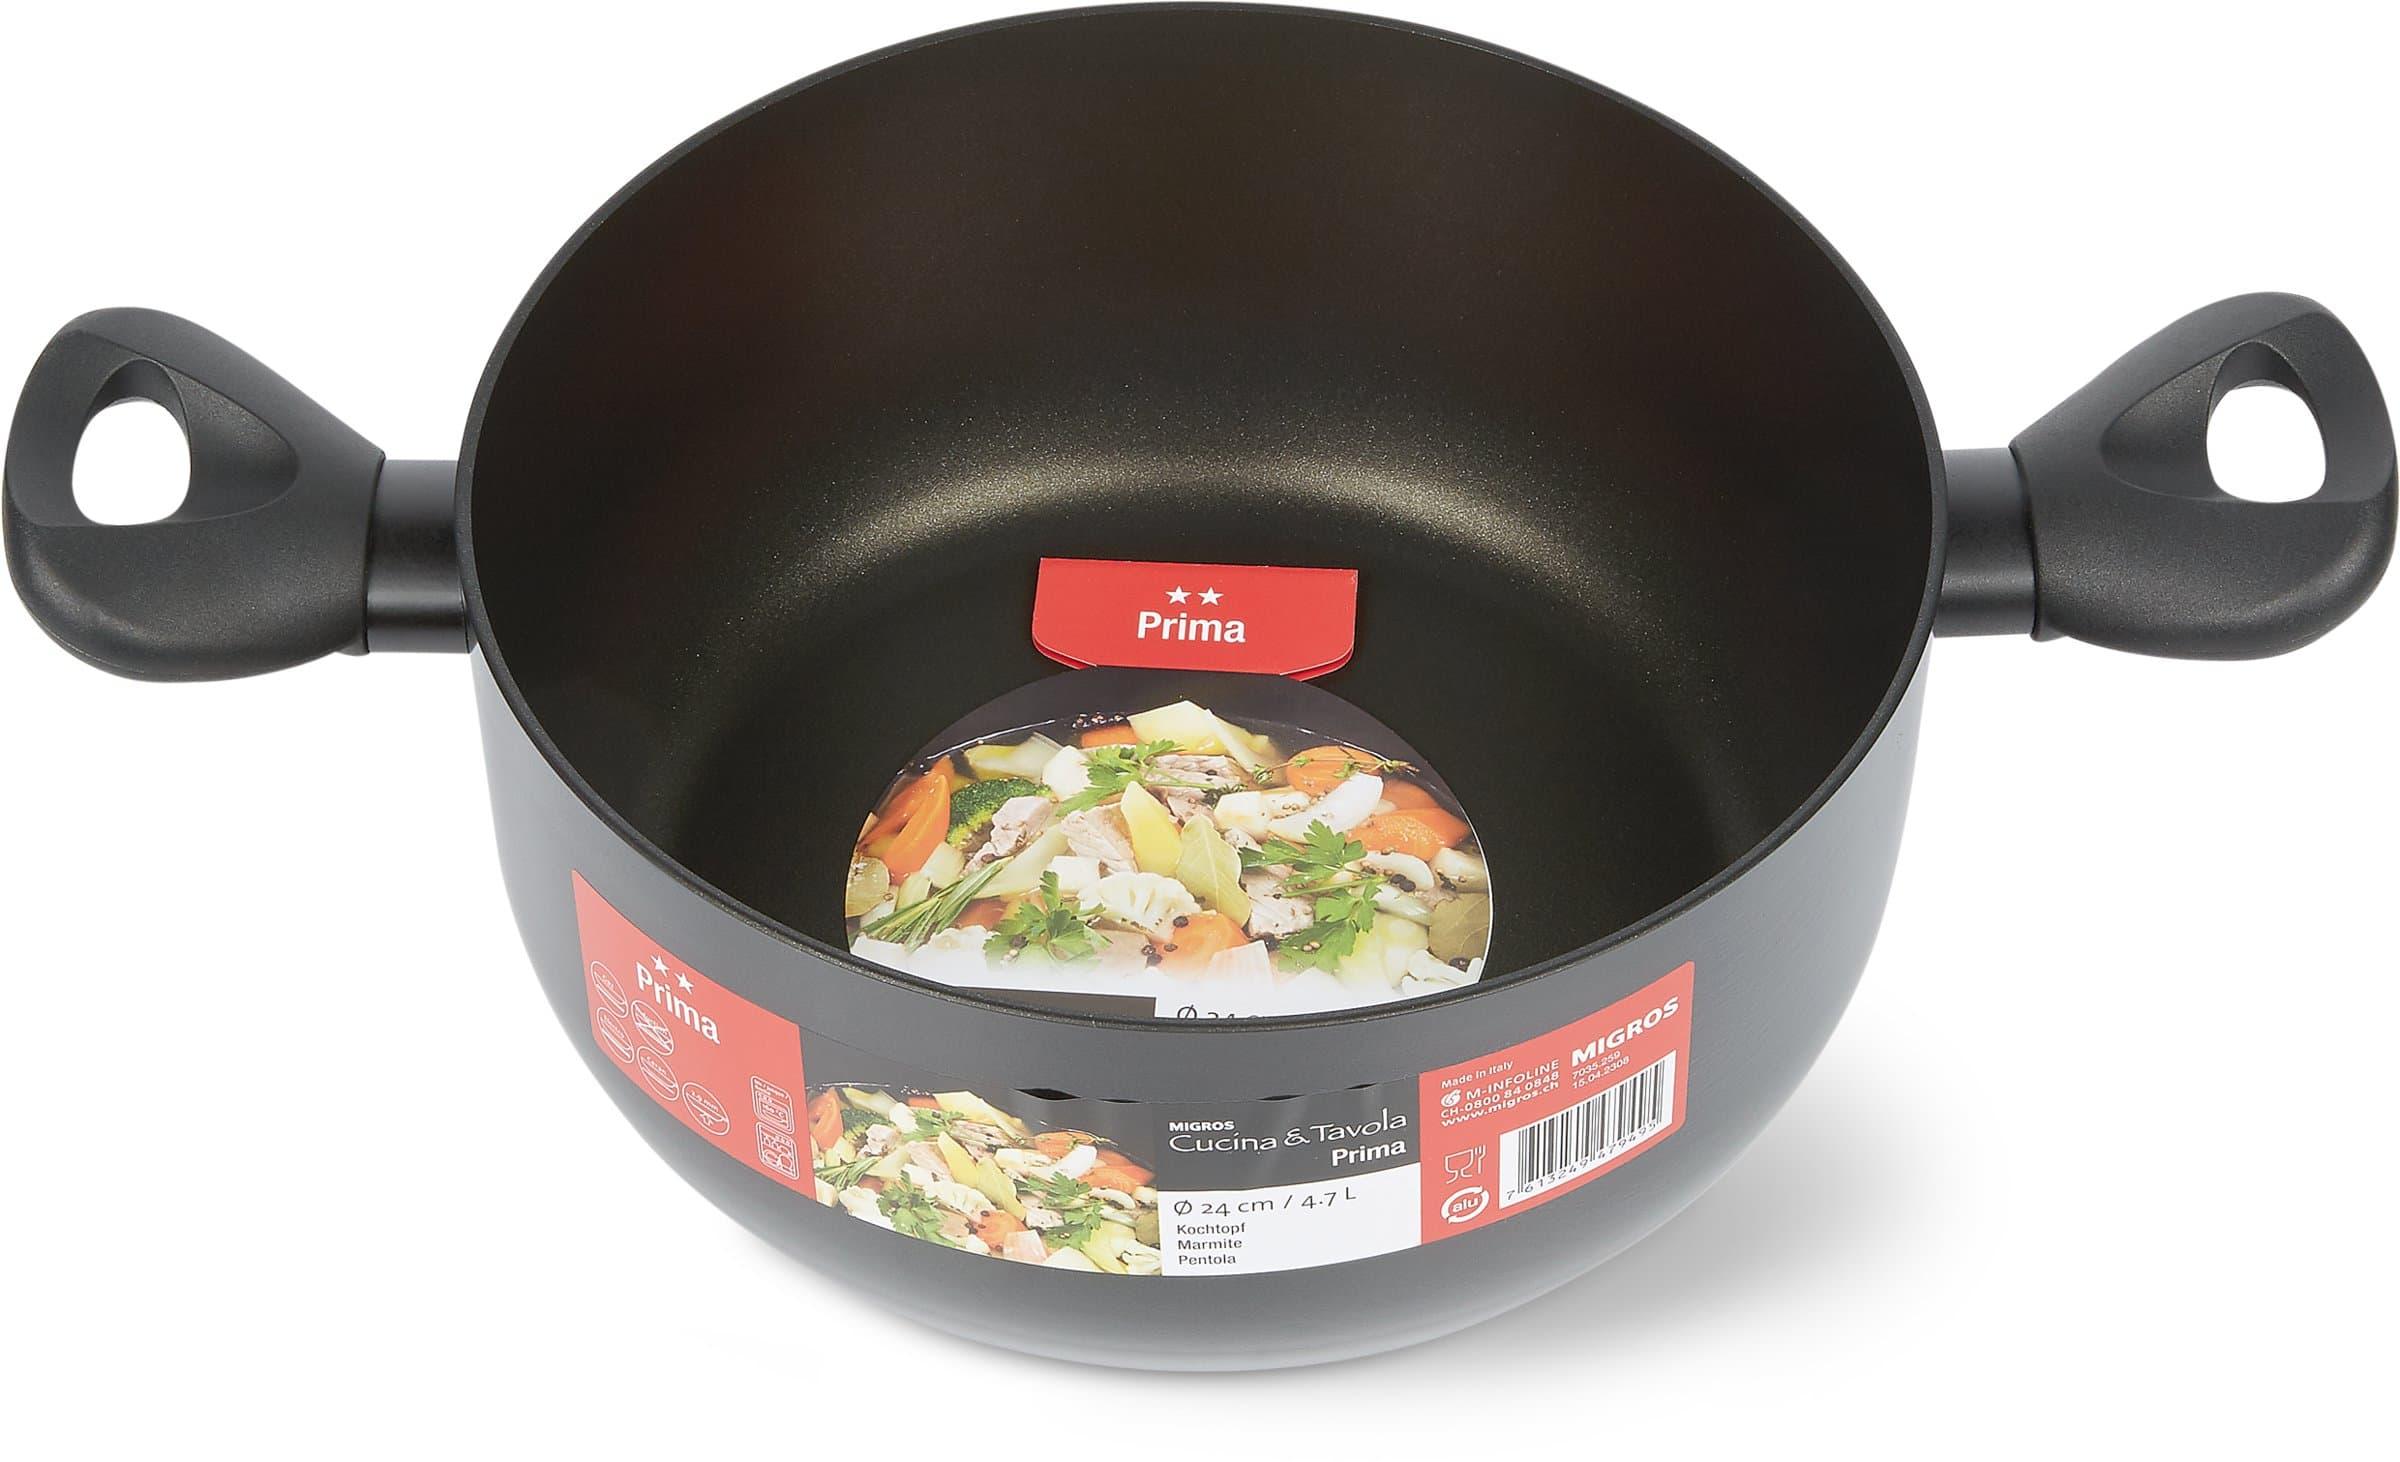 Cucina & Tavola Kochtopf PRIMA